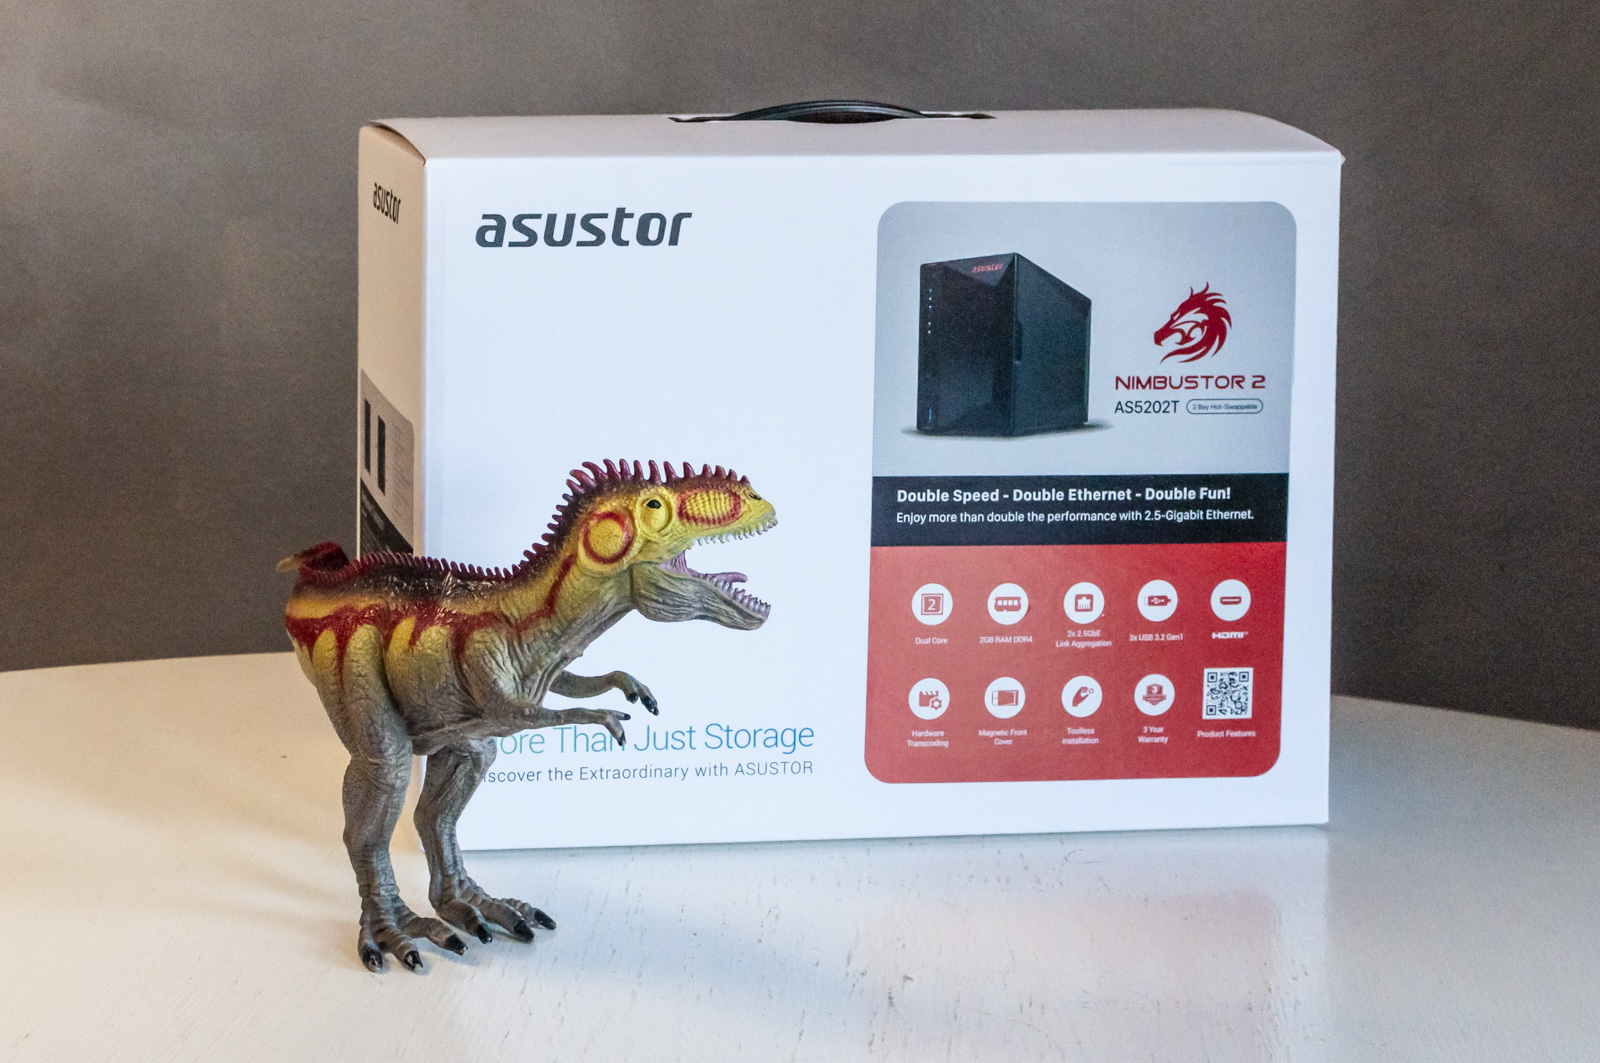 Asustor Nimbustor 2, in prova il NAS per gamers (e affini)